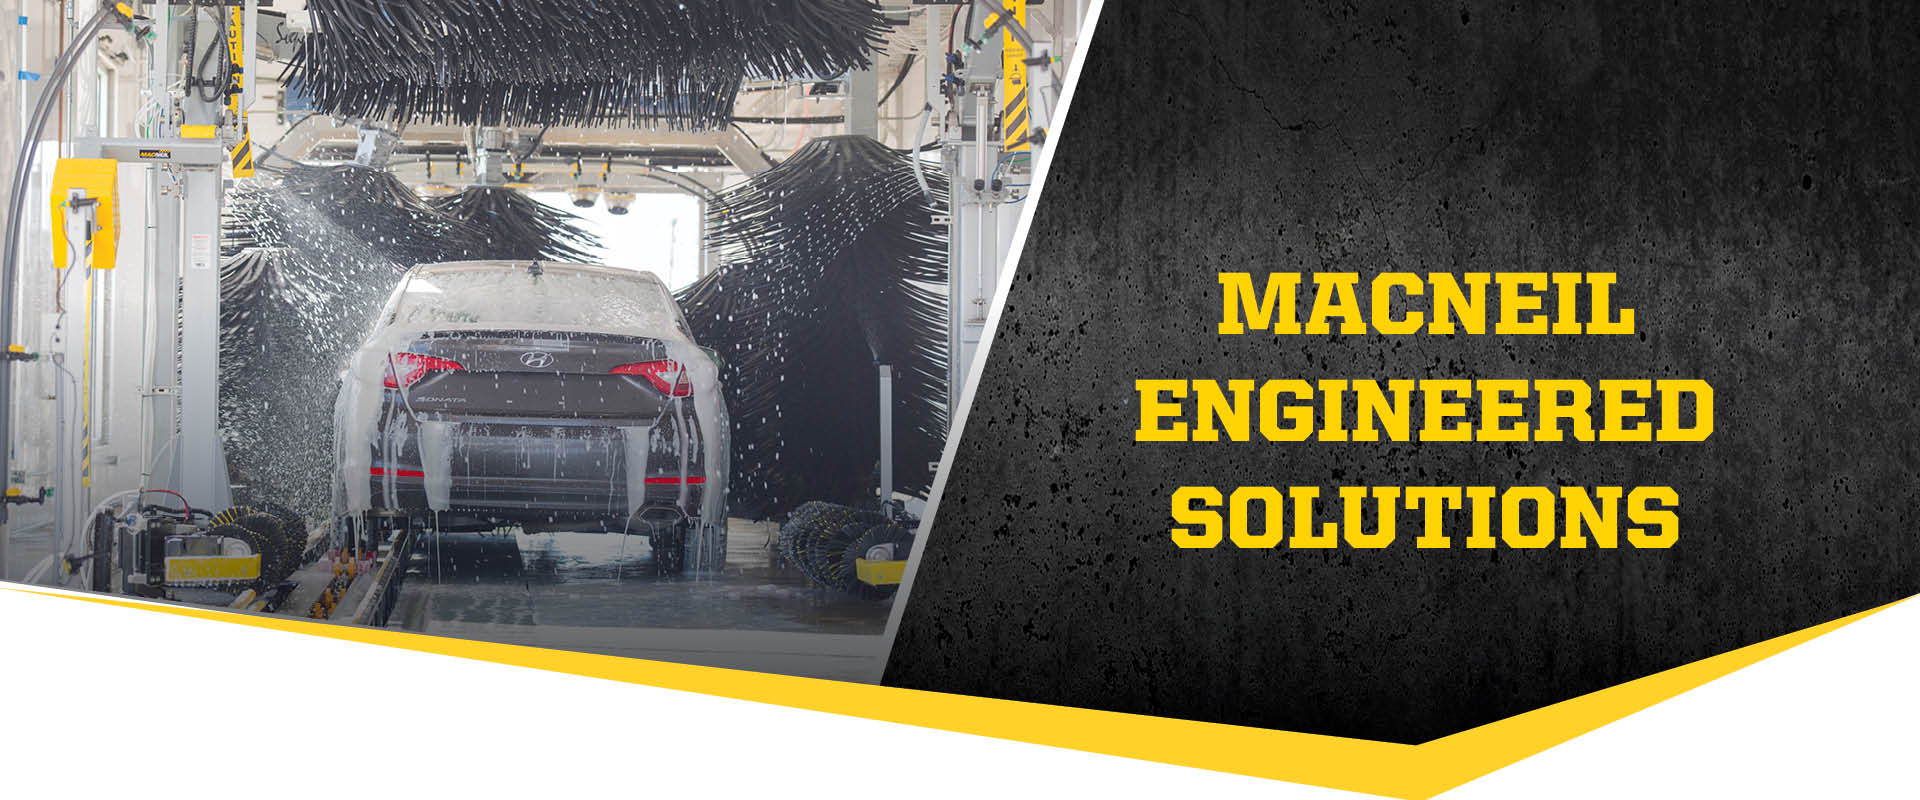 MacNeil-Engineered-Solutions